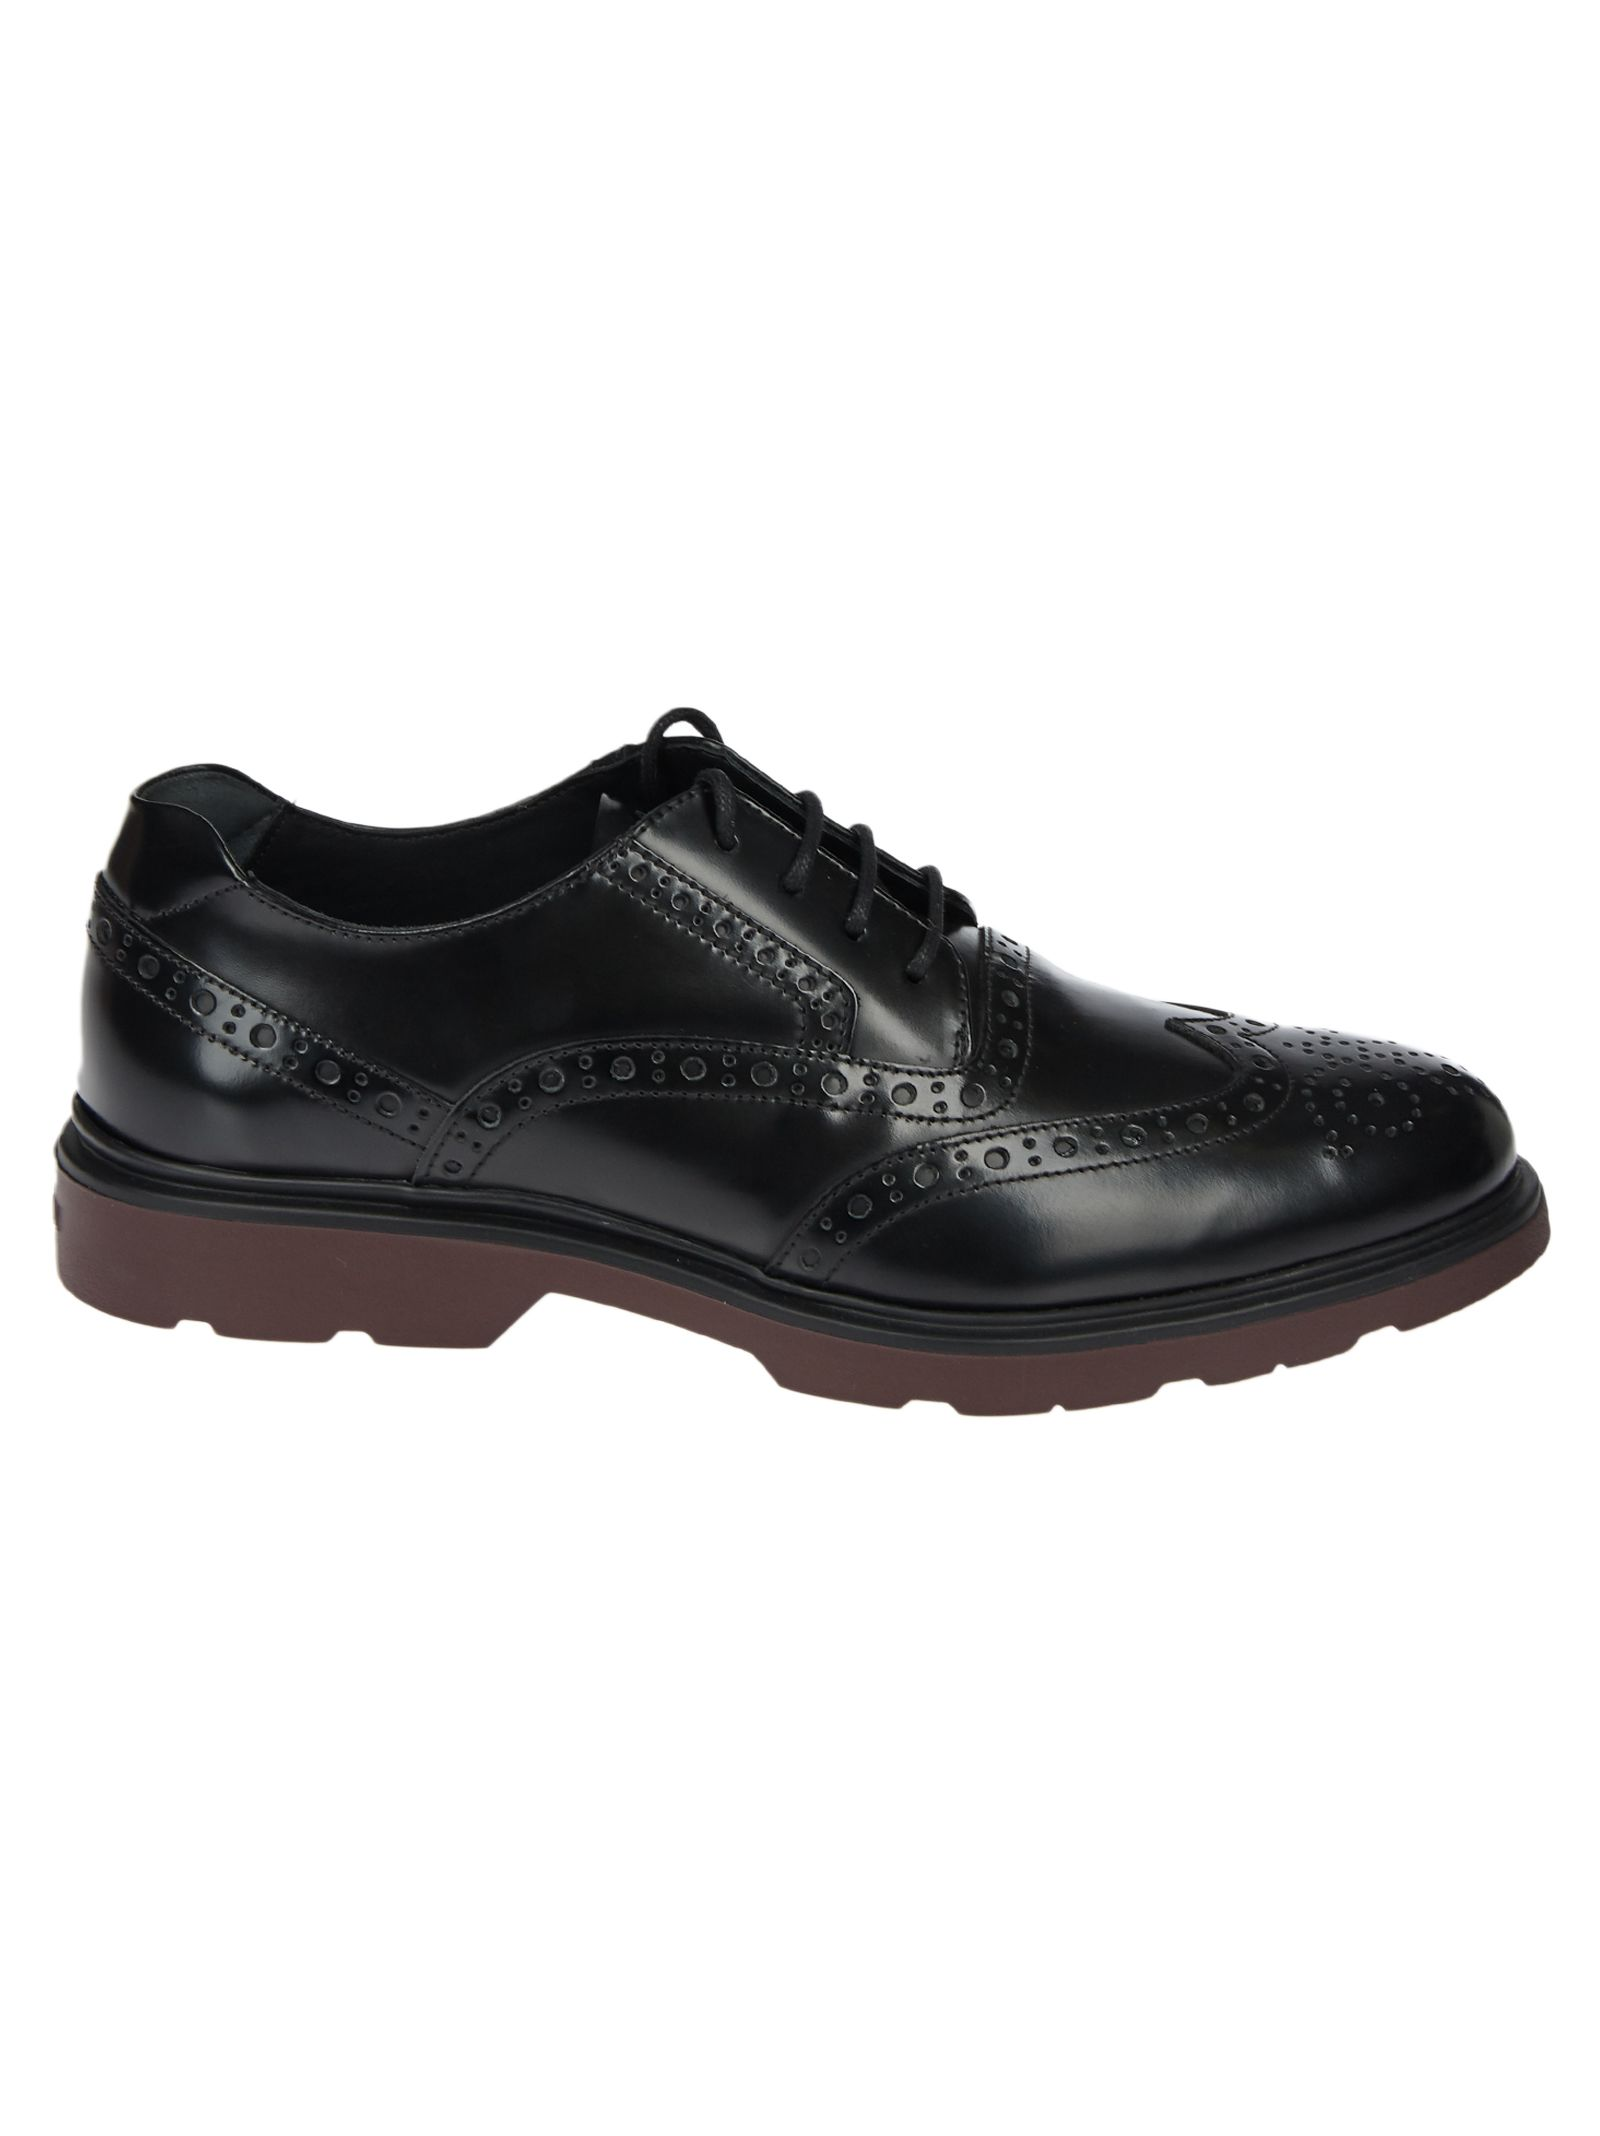 Hogan Brogue Lace-up Shoes